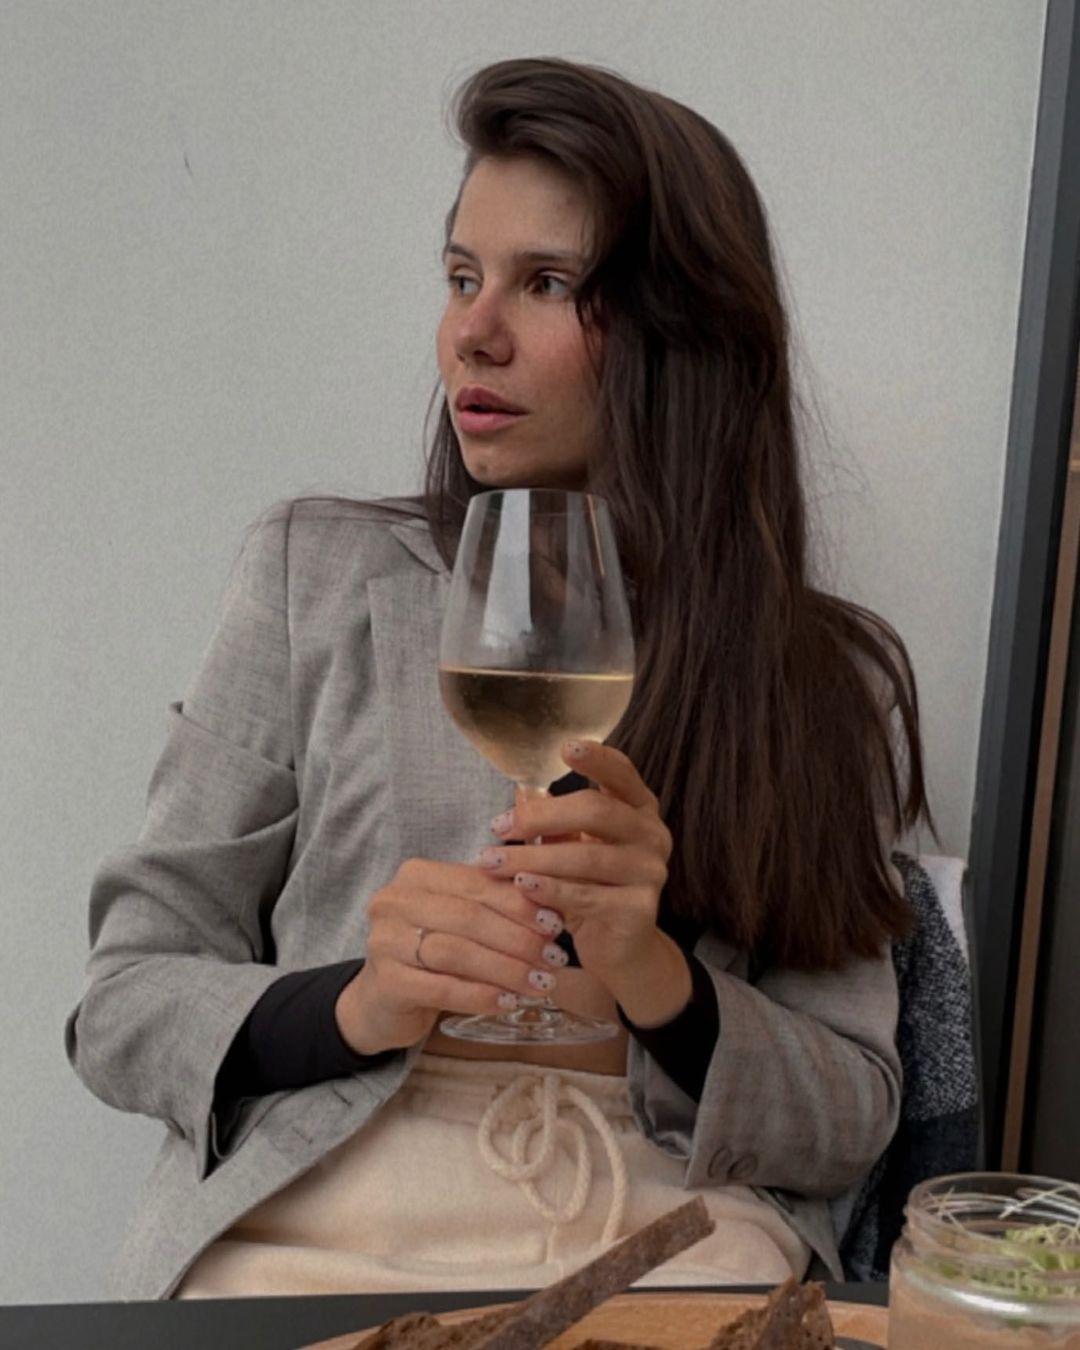 Alyona-Safronova-Wallpapers-Insta-Fit-Bio-15